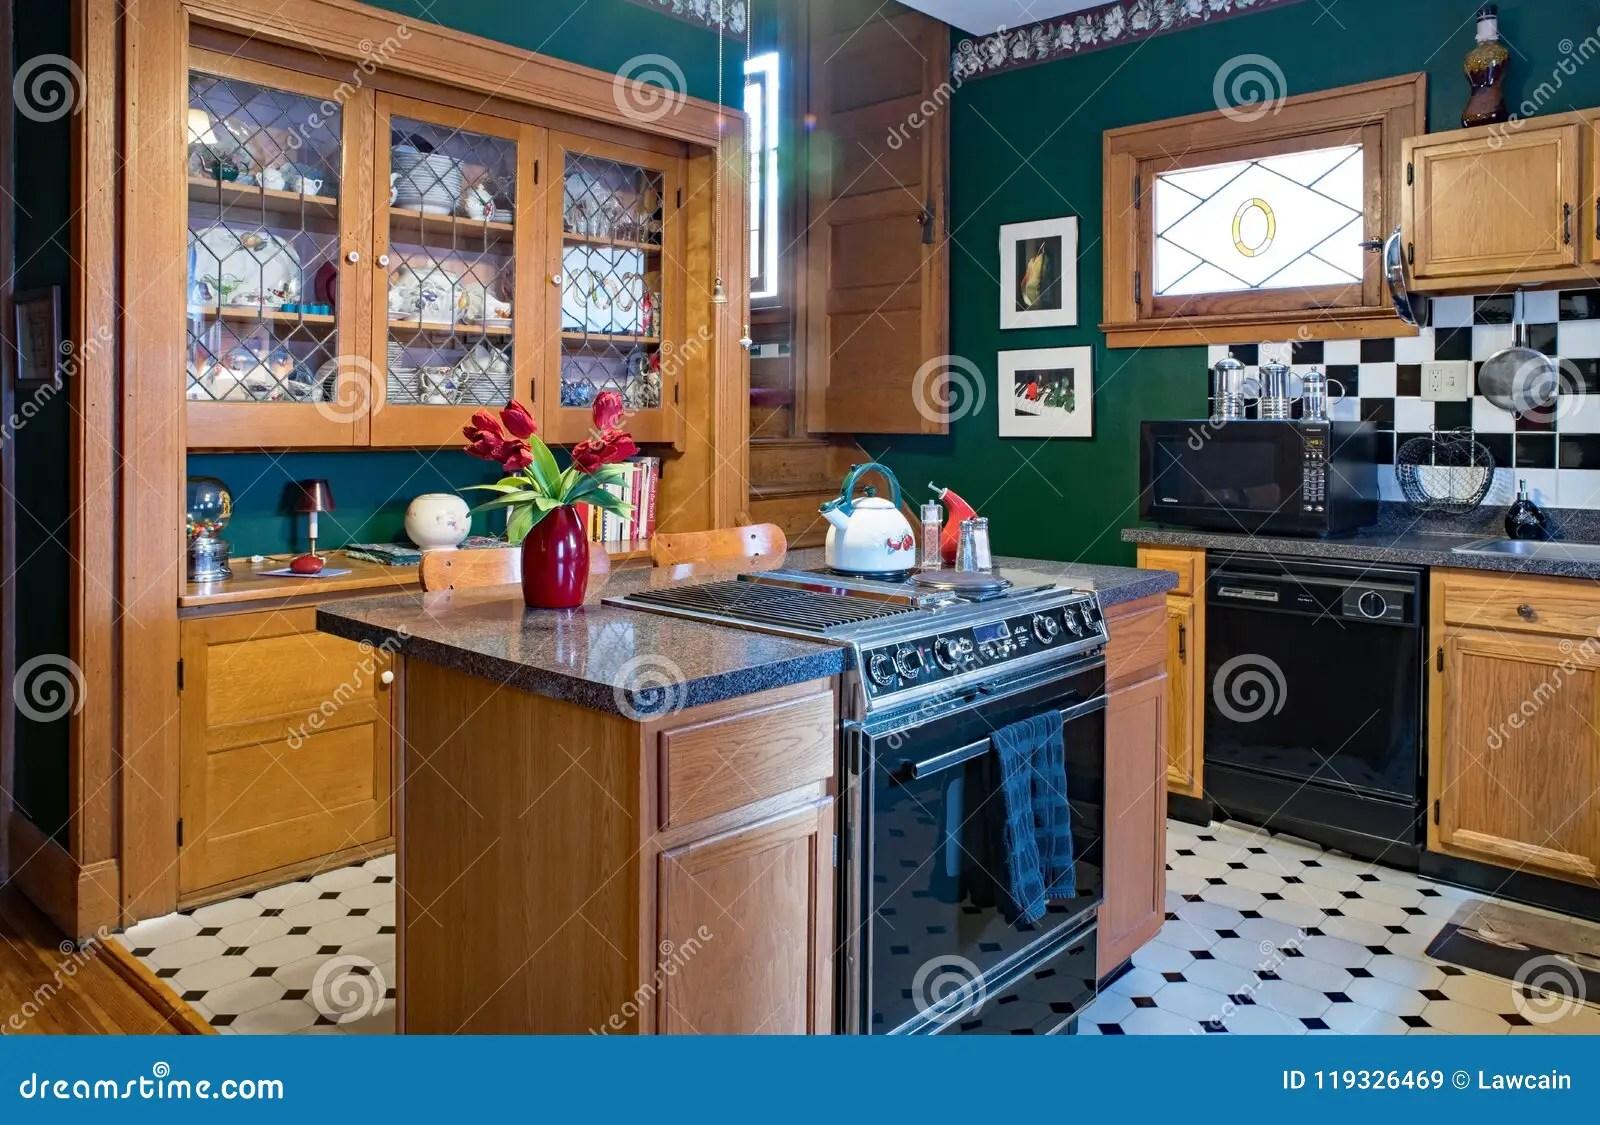 in stock kitchens affordable kitchen knives 有瓷器柜的绿色厨房编辑类库存图片 图片包括有玻璃 生活方式 细木家具 德顿 俄亥俄 美国 2018年6月18日 有固定瓷器柜的绿色厨房 中心海岛 黑 白色主题的装饰 后面楼梯在一个一百年老房子里